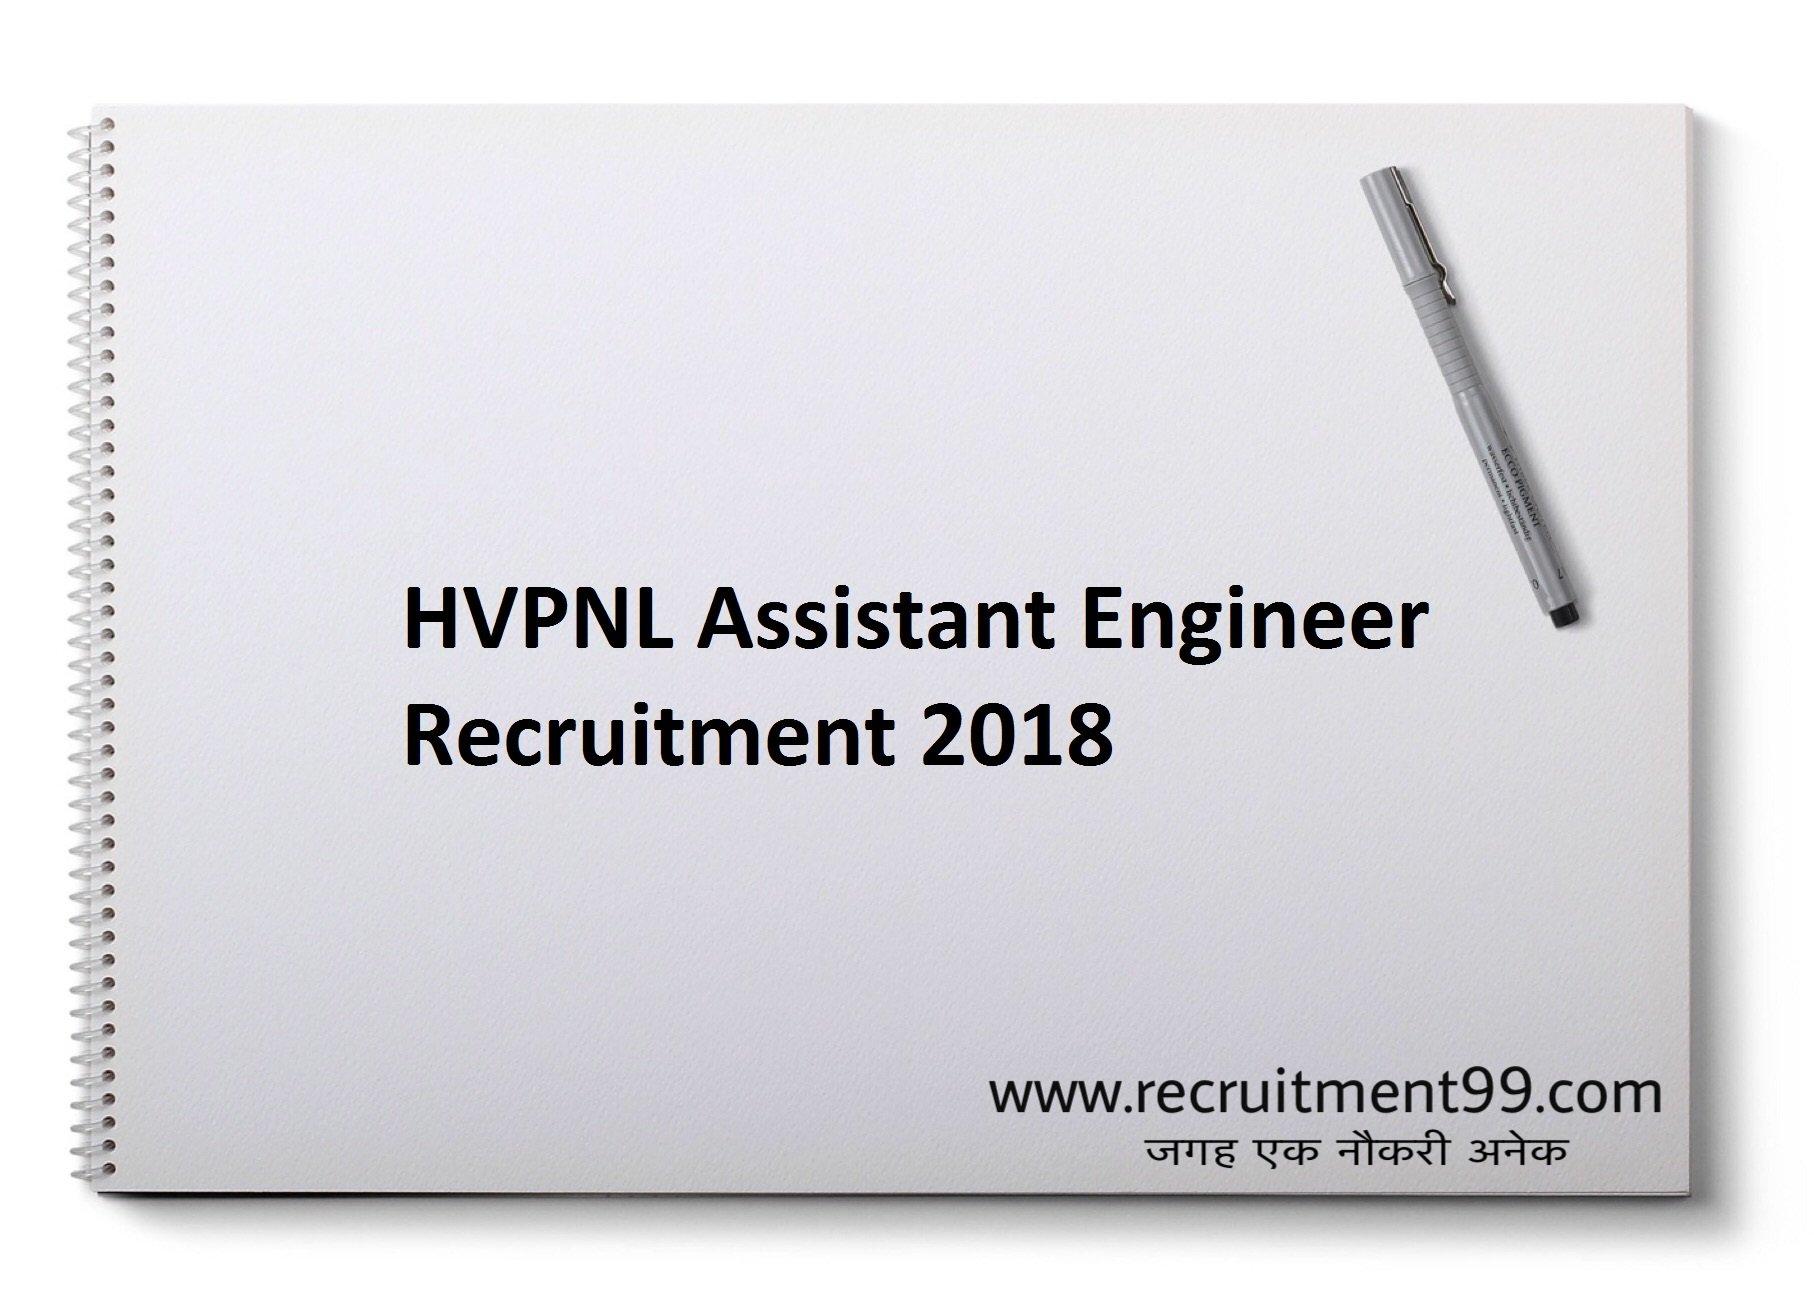 HVPNL Assistant Engineer Recruitment Admit Card Result 2018